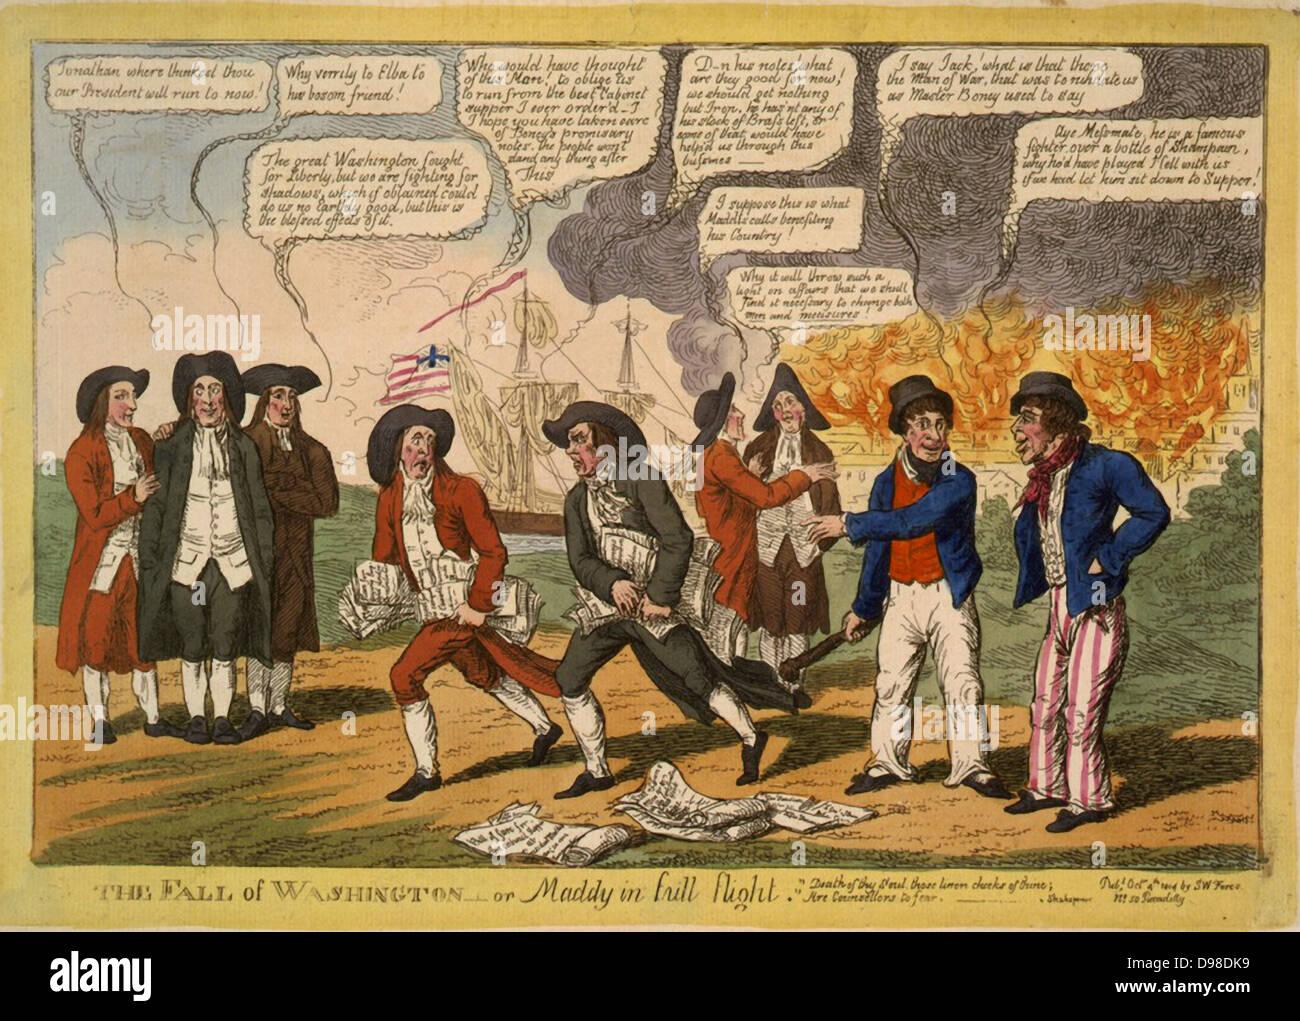 1812 Cartoon Imágenes De Stock & 1812 Cartoon Fotos De Stock - Alamy